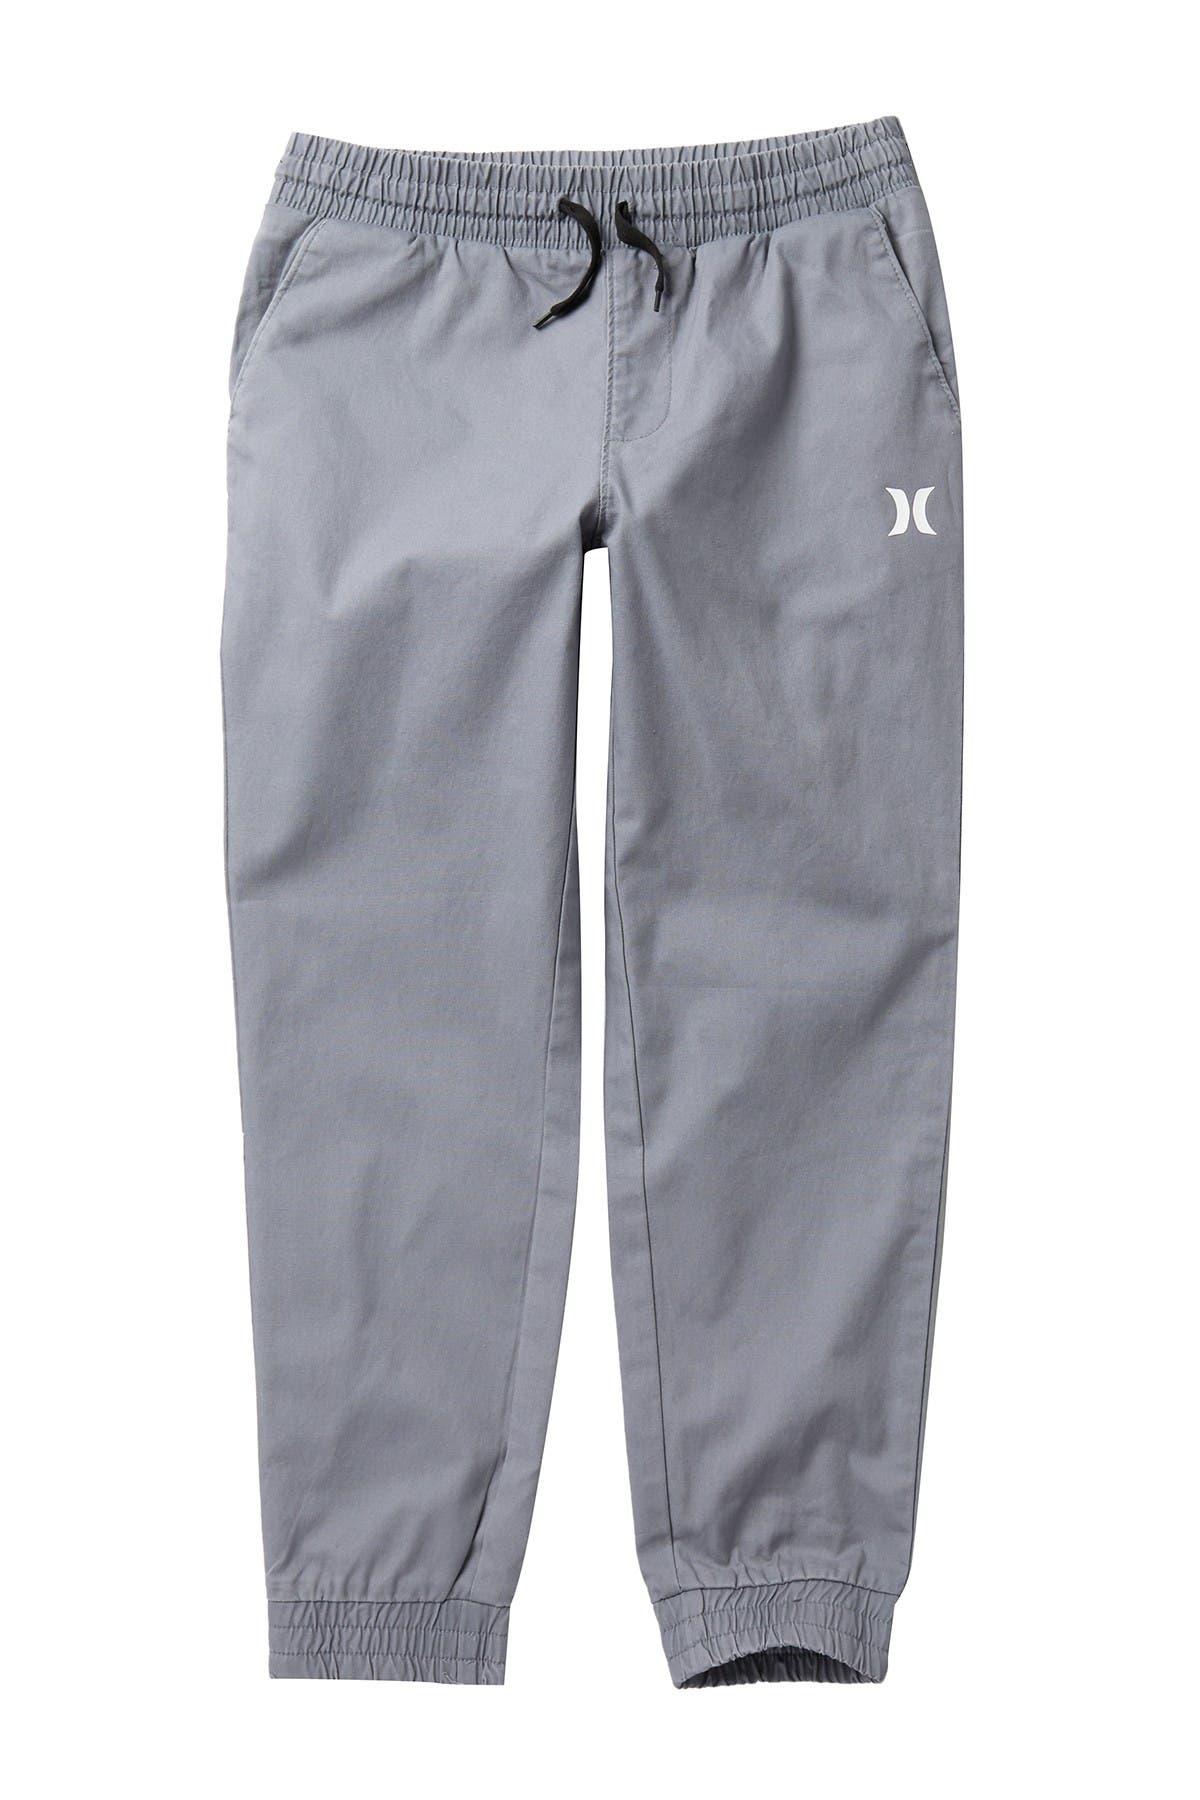 Image of Hurley DRI-FIT Chino Pants